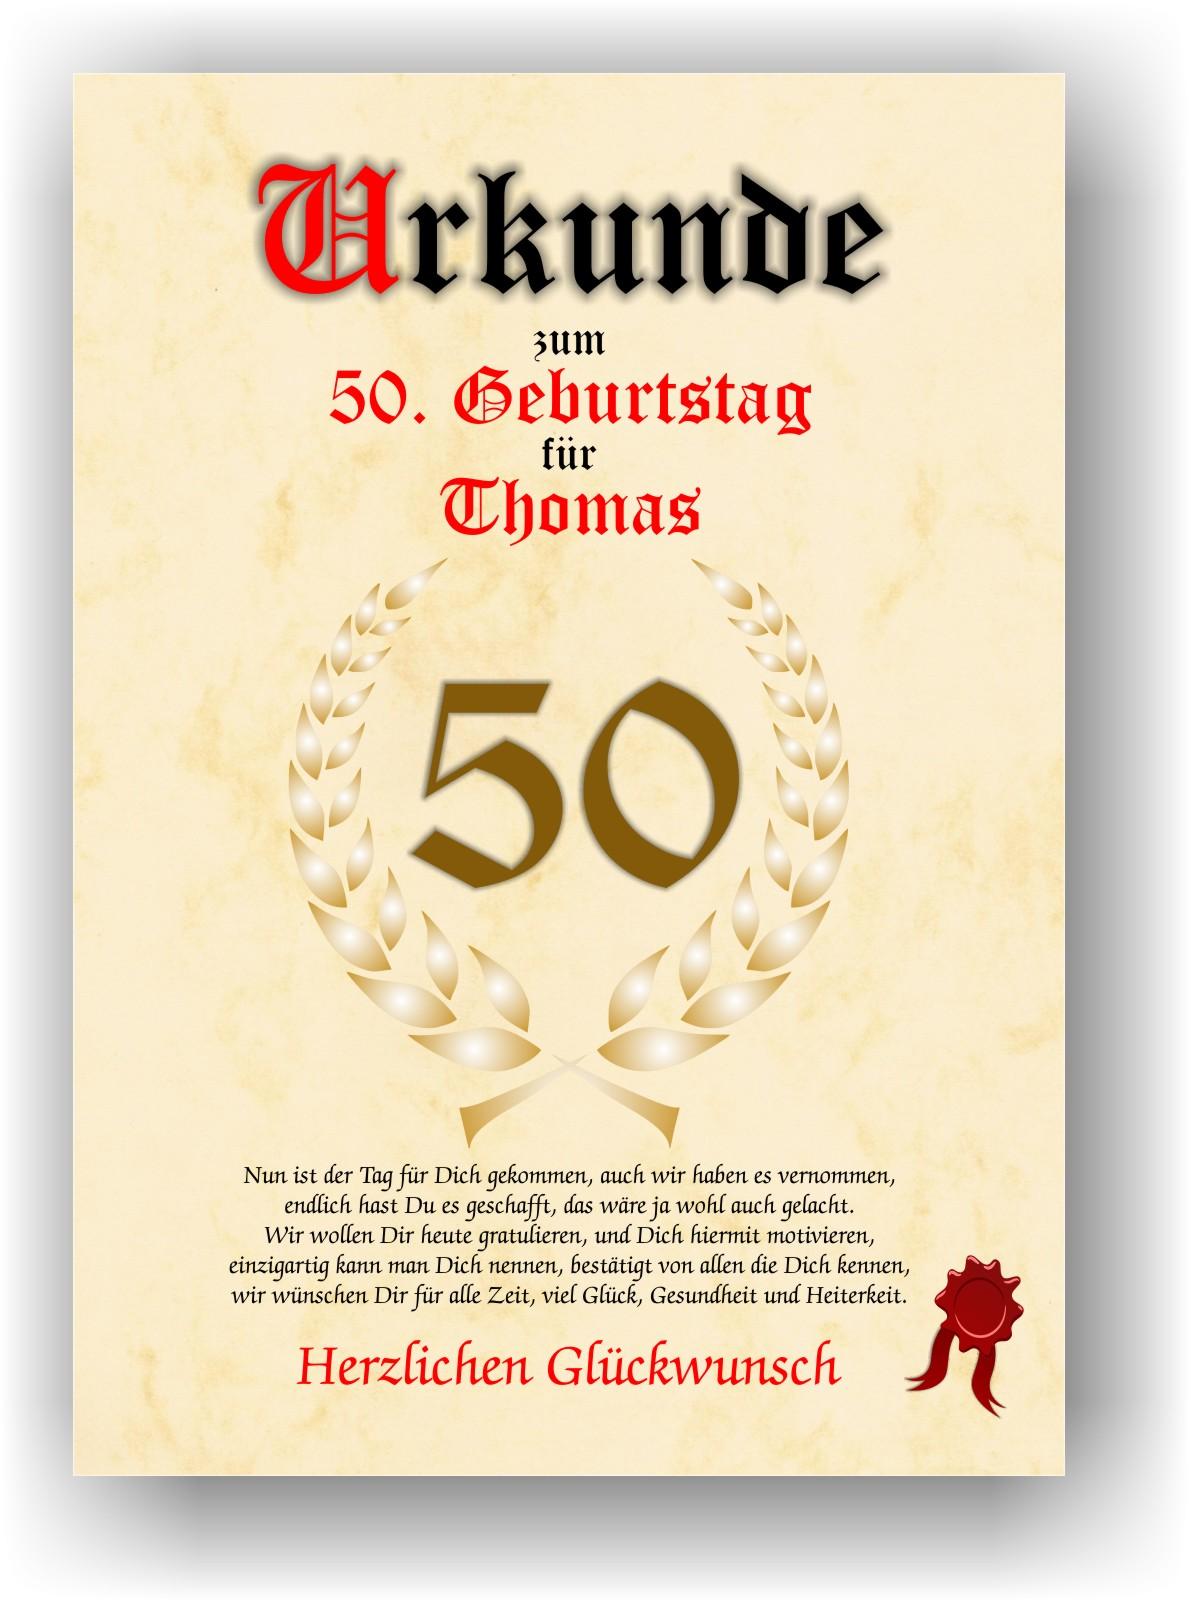 Urkunde zum 50 geburtstag geschenkidee geburtstagsurkunde for Deko geburtstag 50